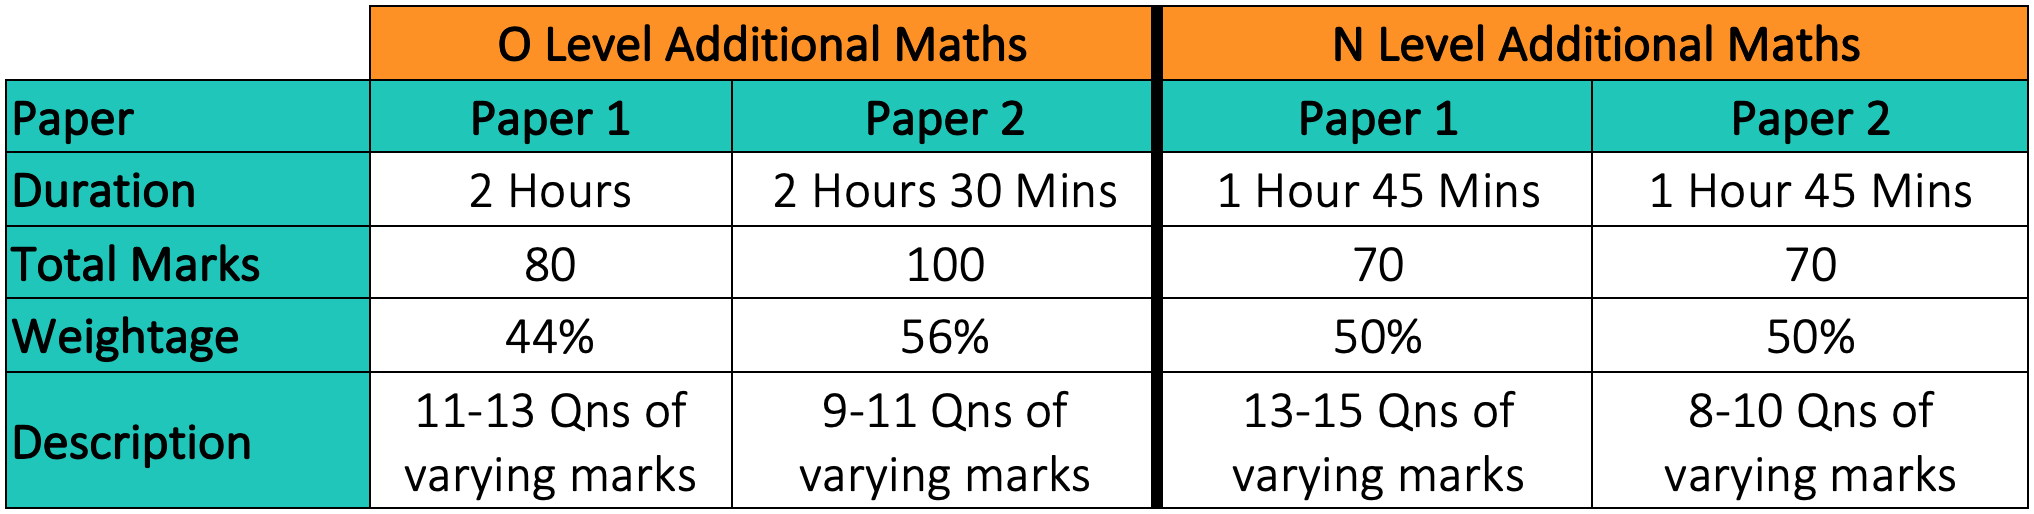 Singapore O / N Level Additional Maths Exam Format